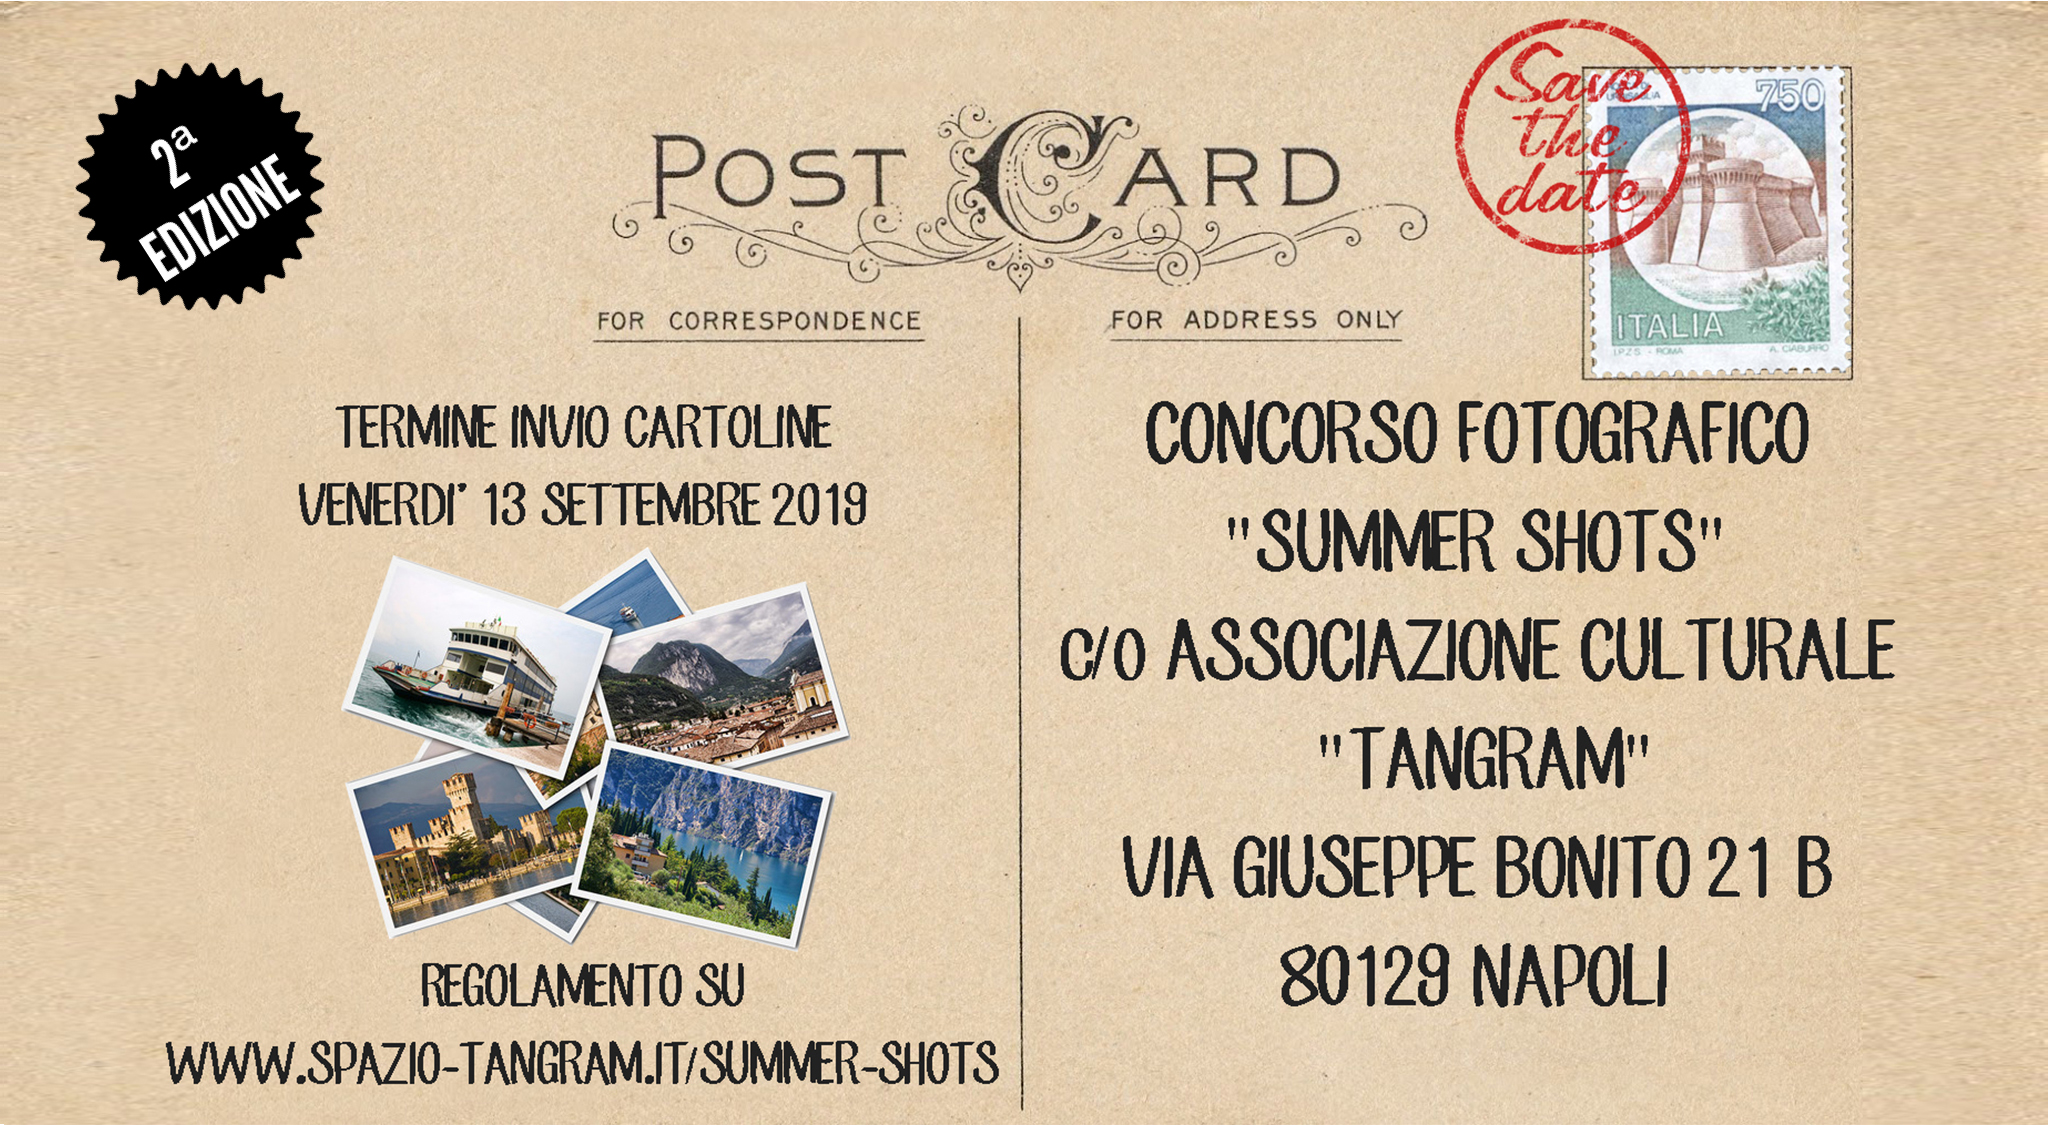 Concorso Fotografico Summer Shots - mandaci una cartolina